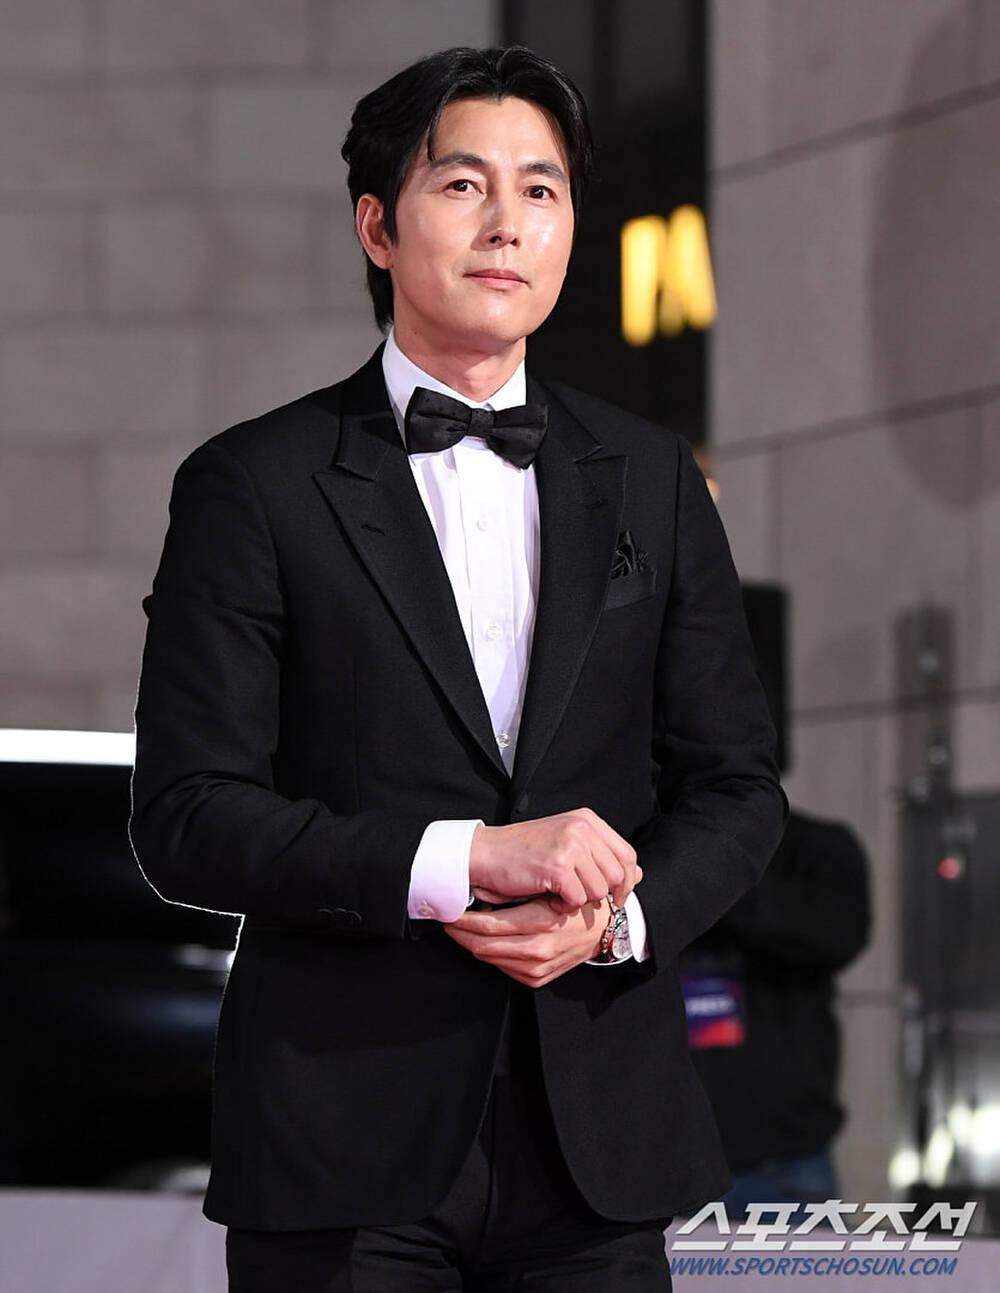 Thảm đỏ 'Rồng xanh 2020': Shin Hye Sun 'cân sắc' Shin Min Ah, Jung Woo Sung - Lee Byung Hun điển trai! Ảnh 10